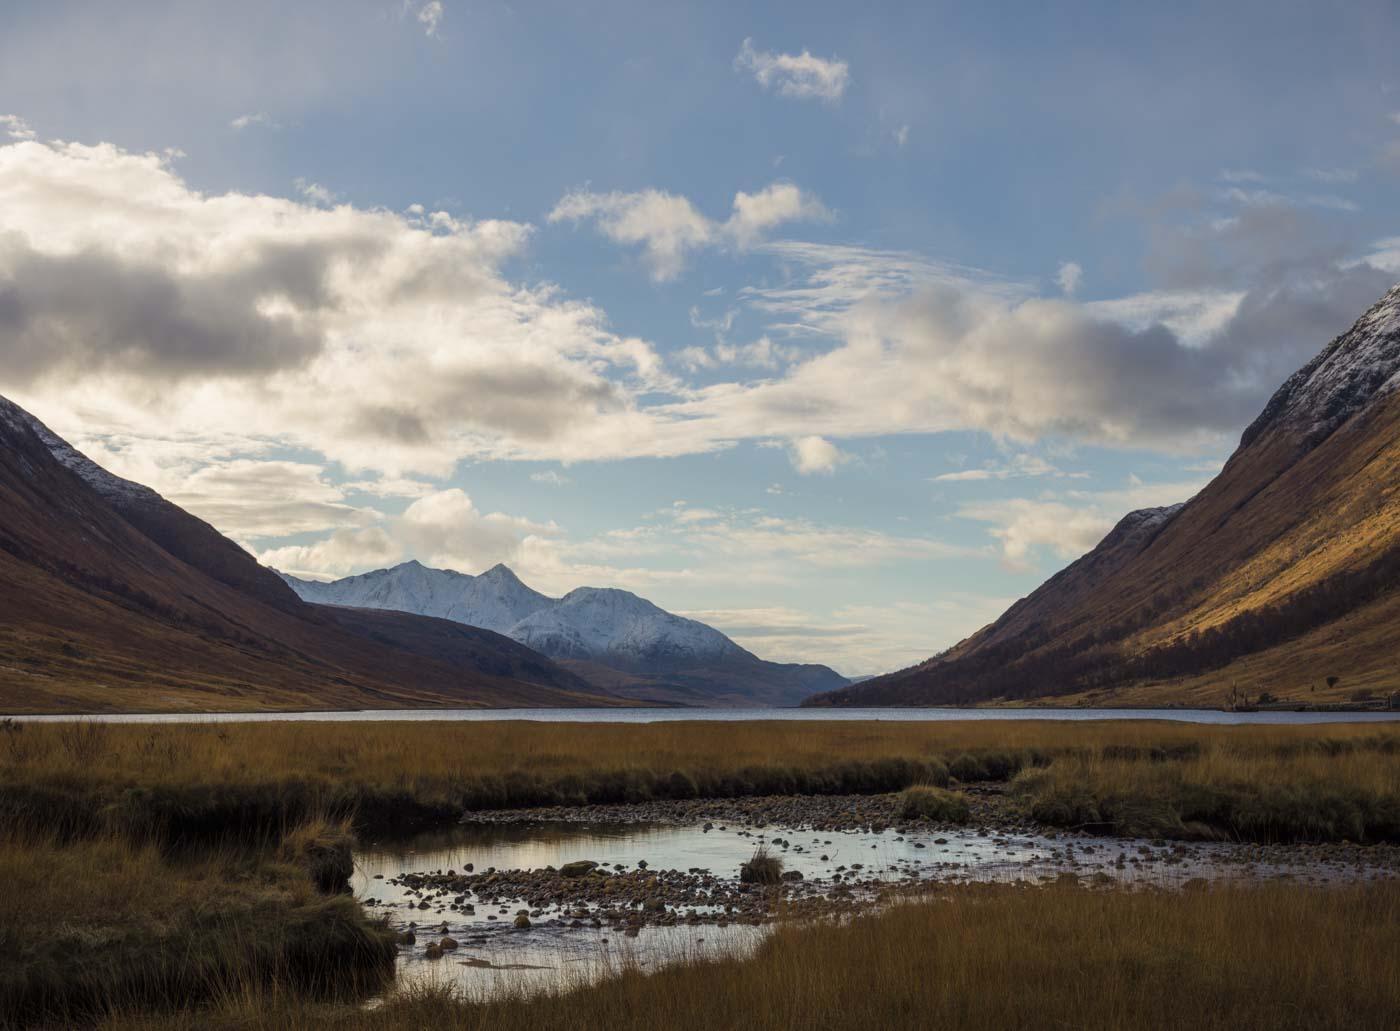 photograph of the Scottish highlands near Glencoe.